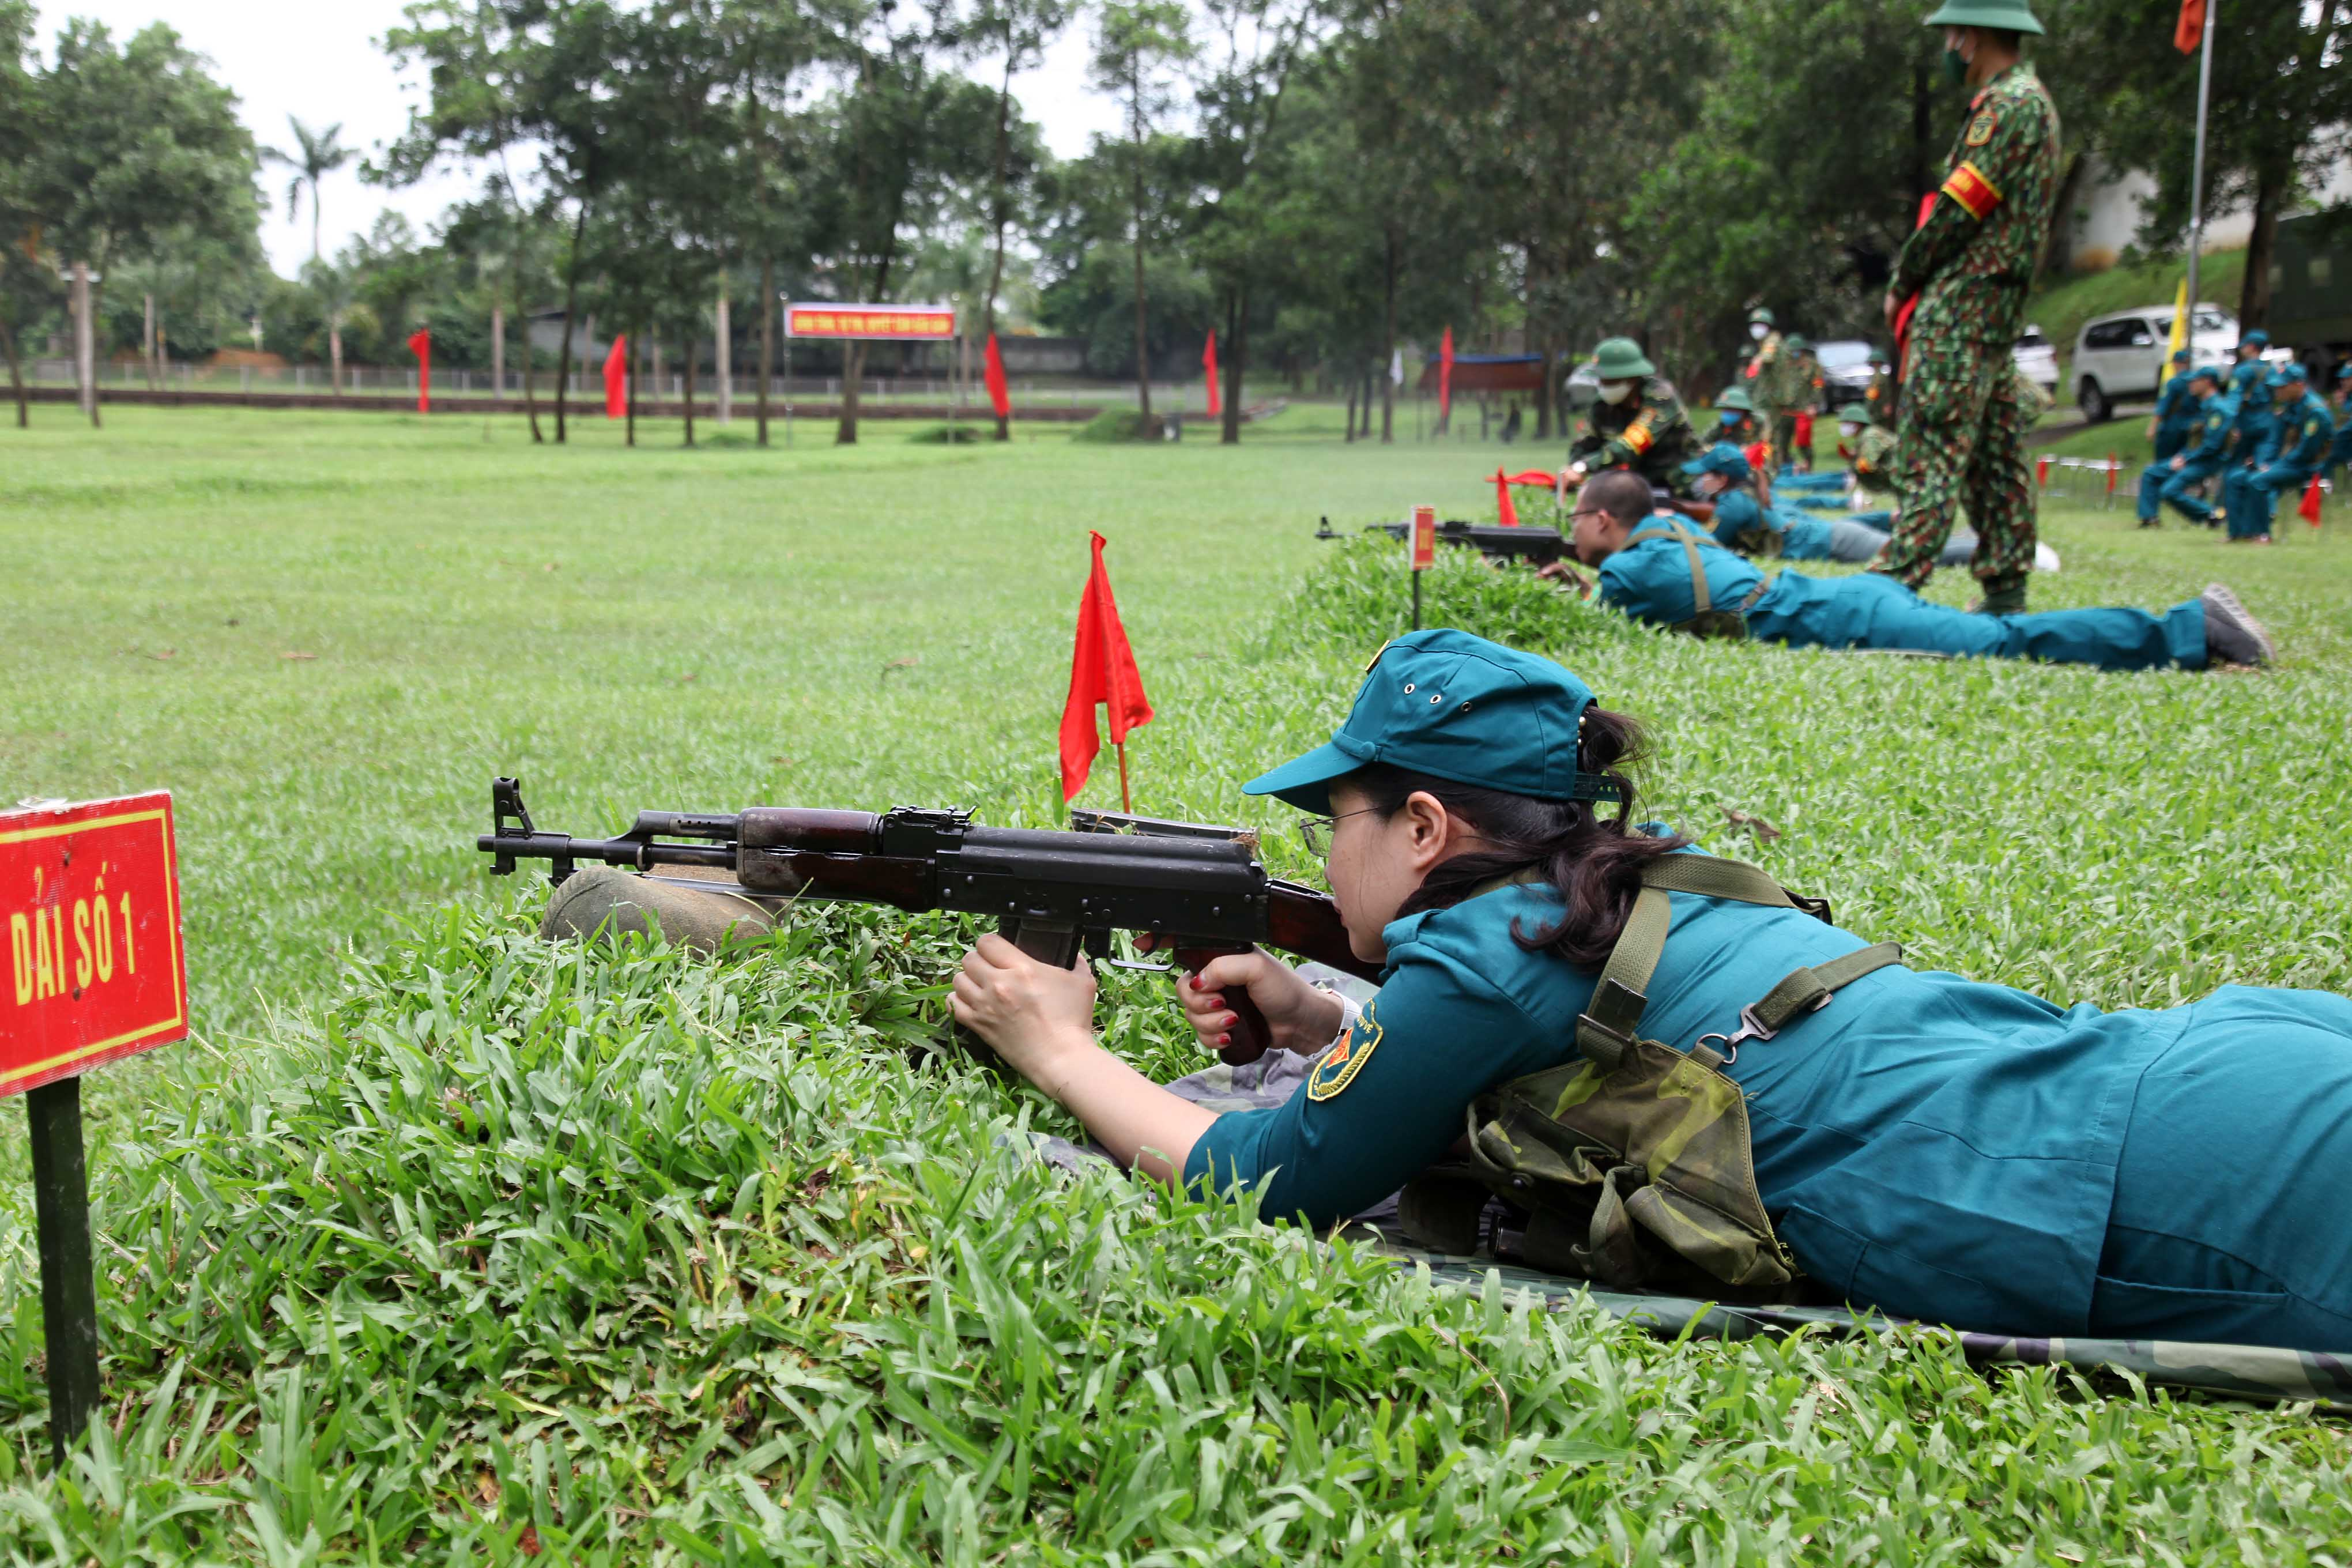 IMC Tập huấn bắn đạn thật 2020